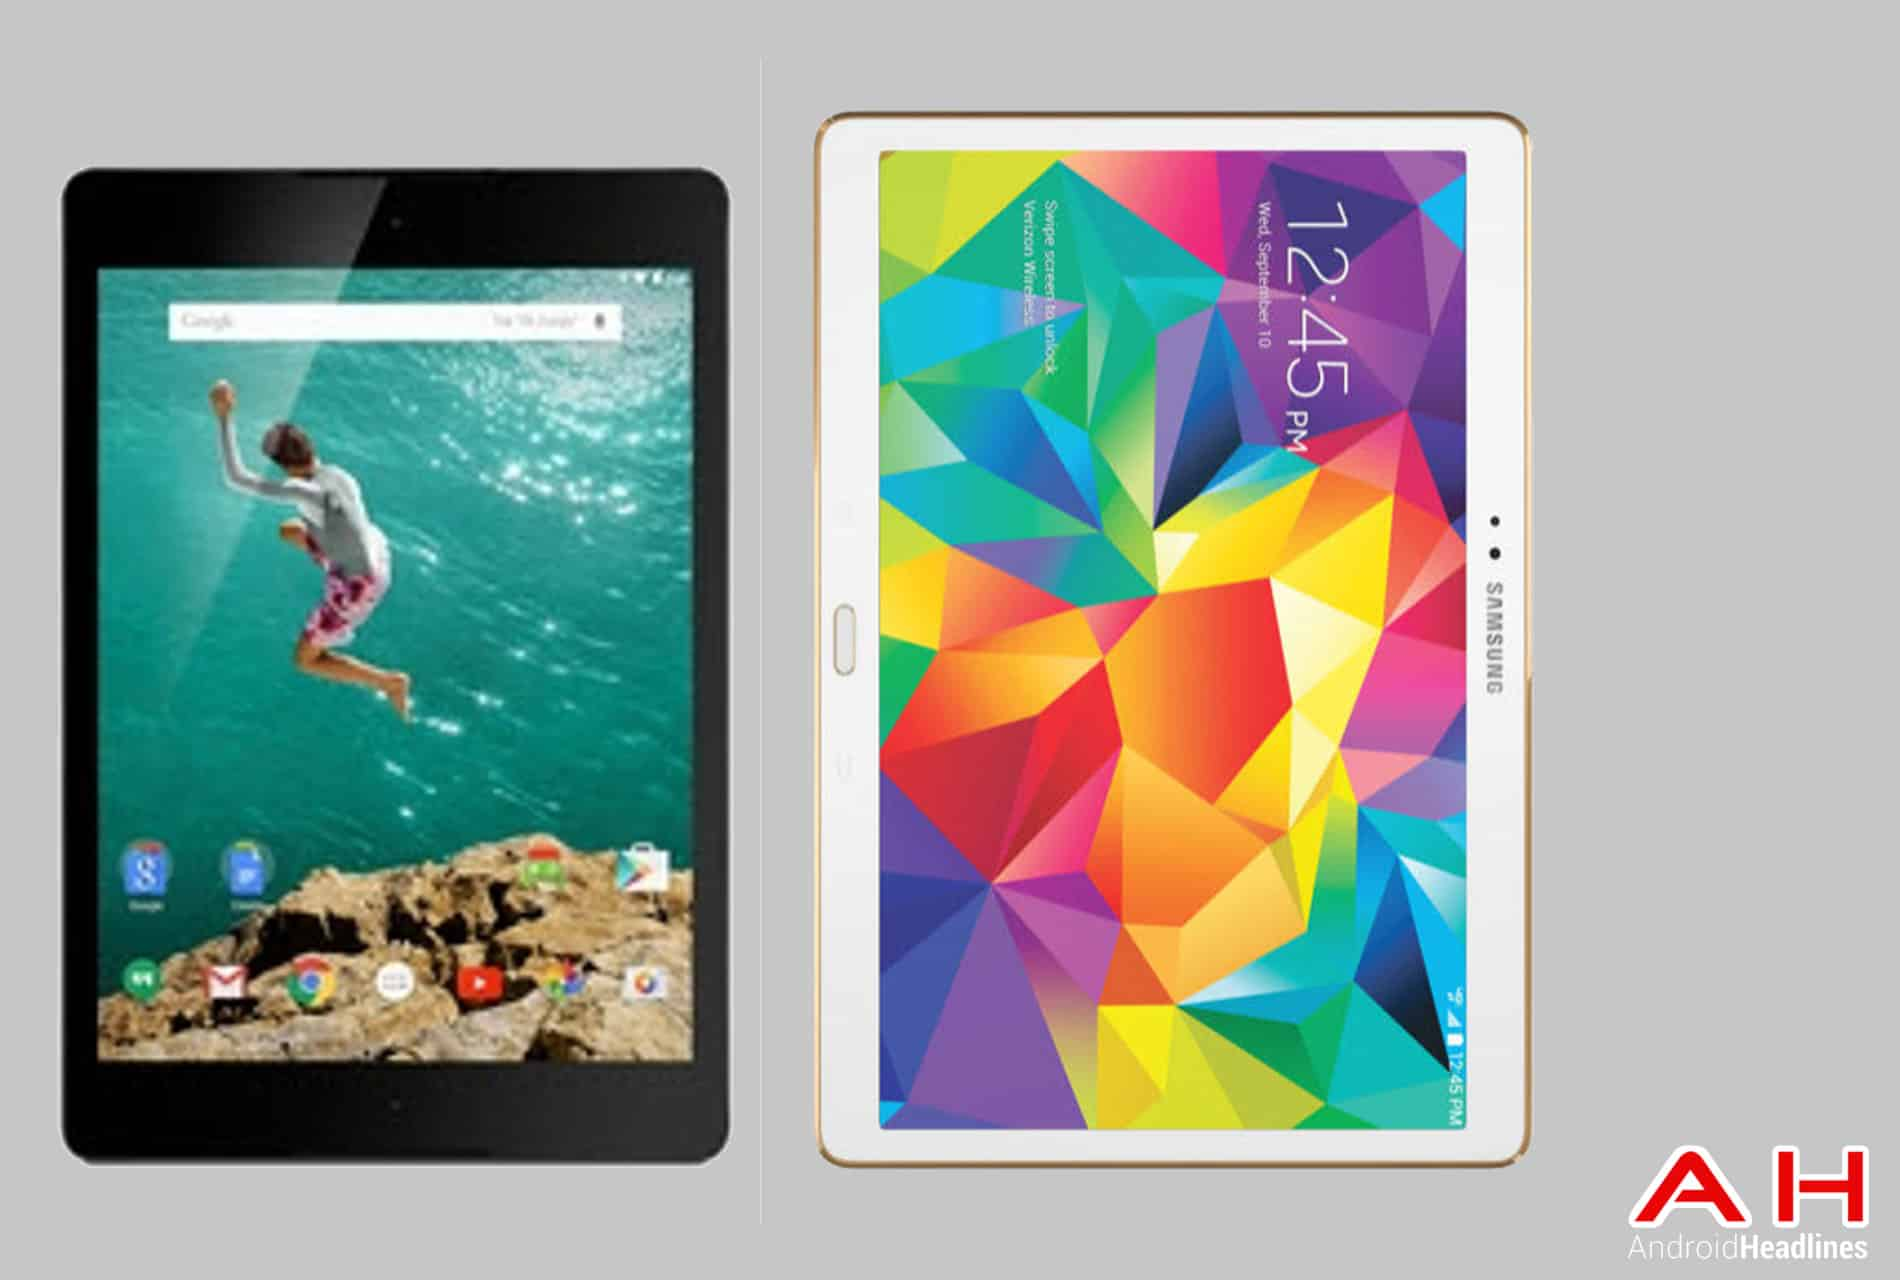 Nexus 9 vs Galaxy Tab S 10.5 cam AH